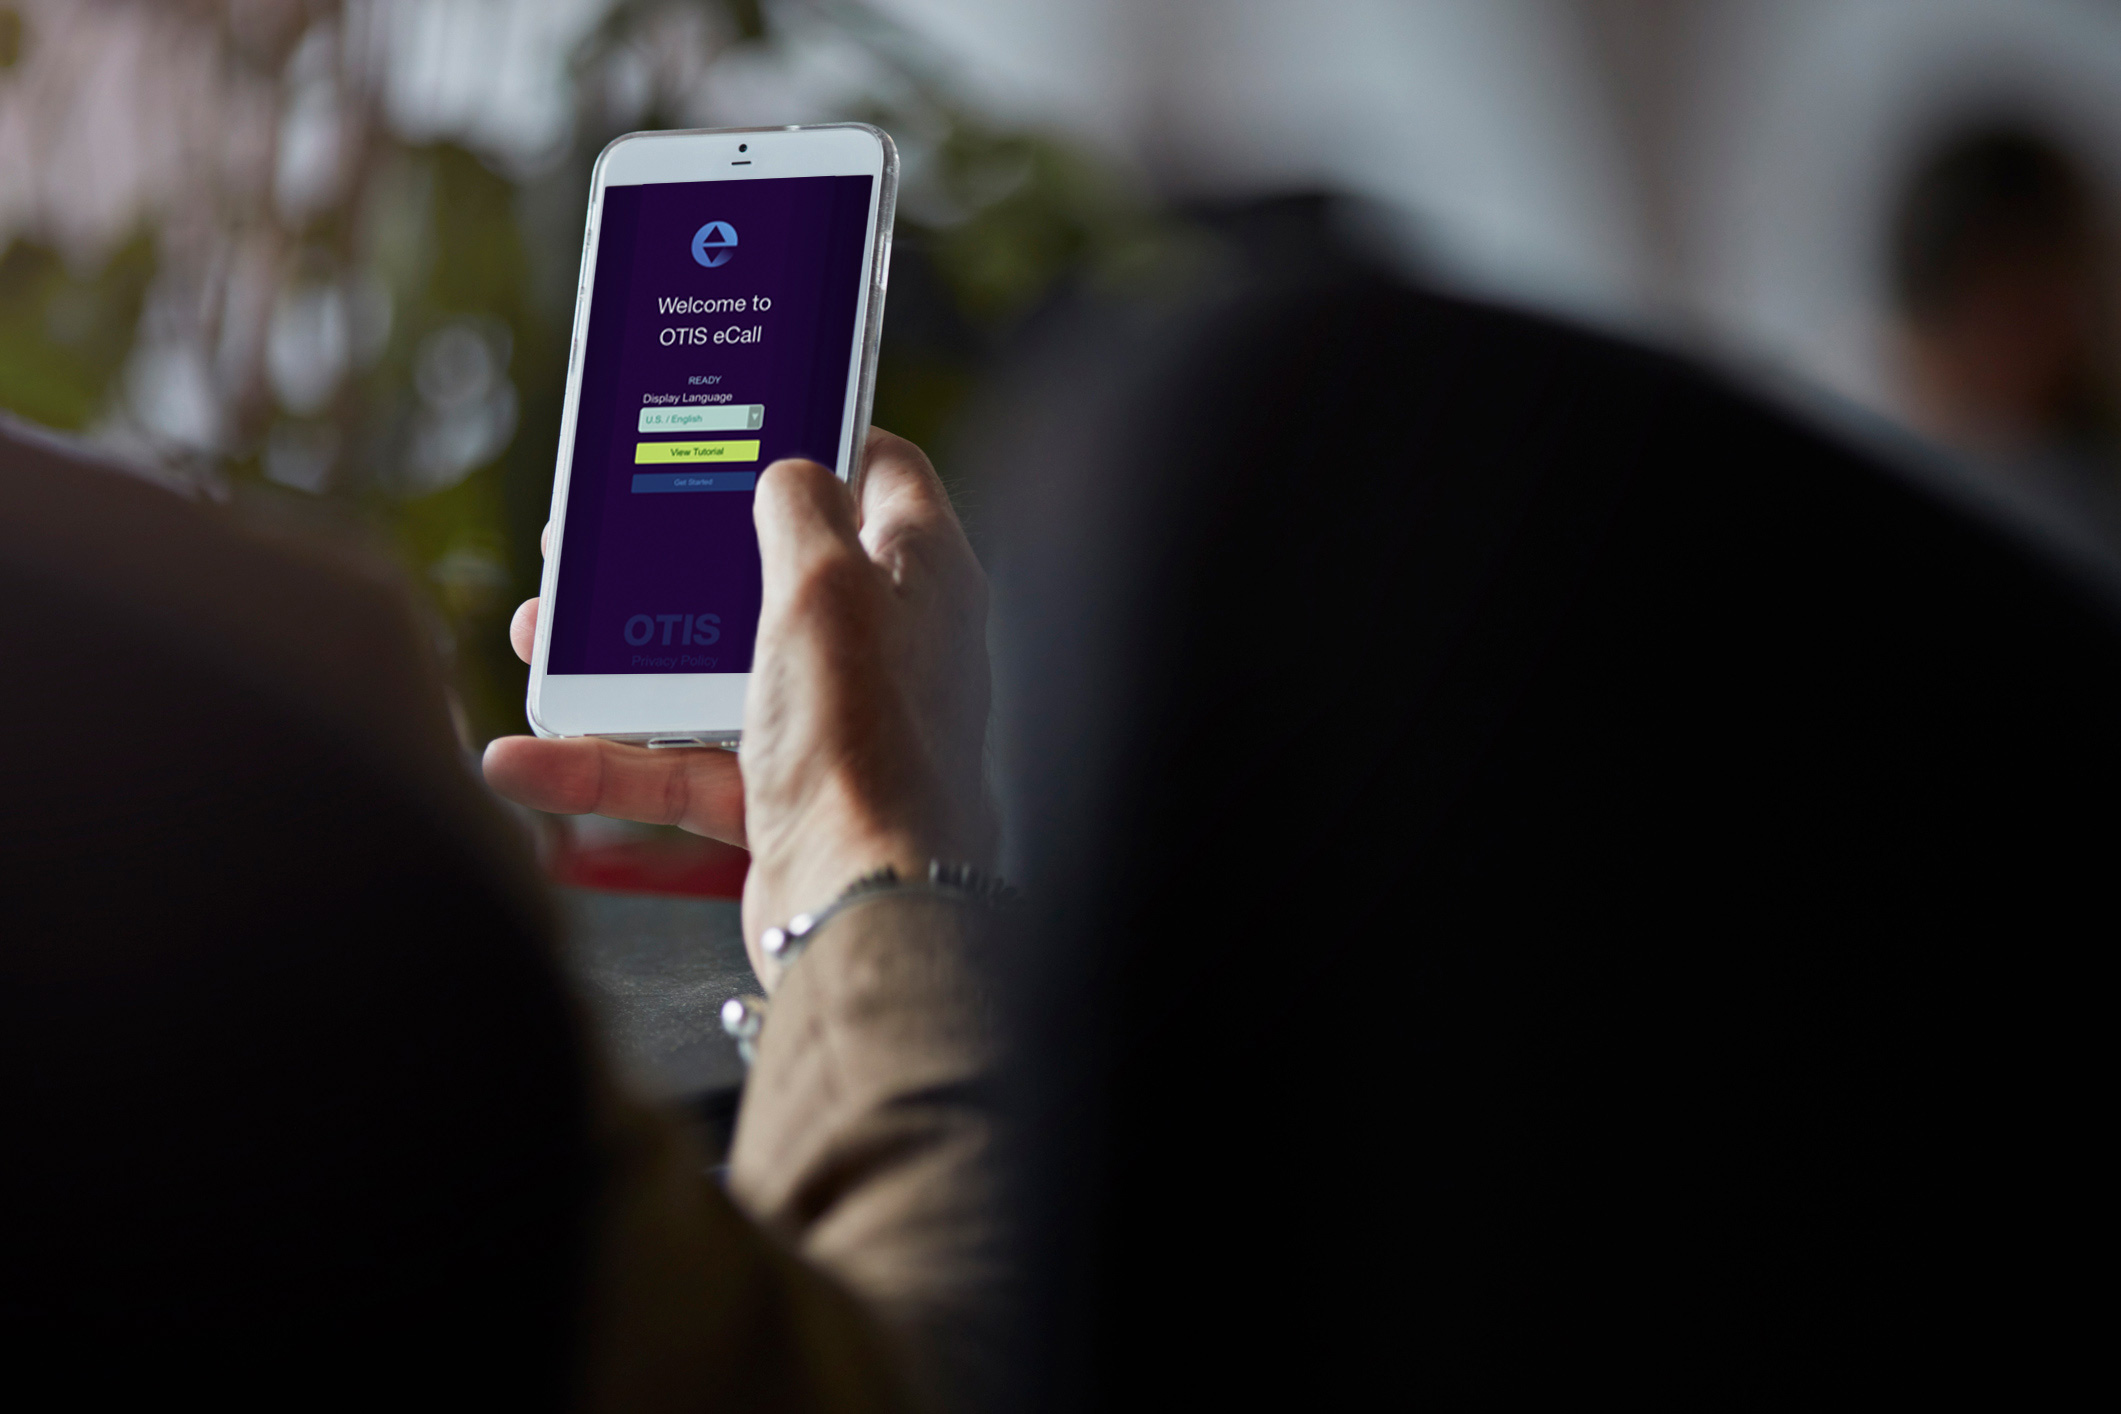 otis-ecall-iphone-app